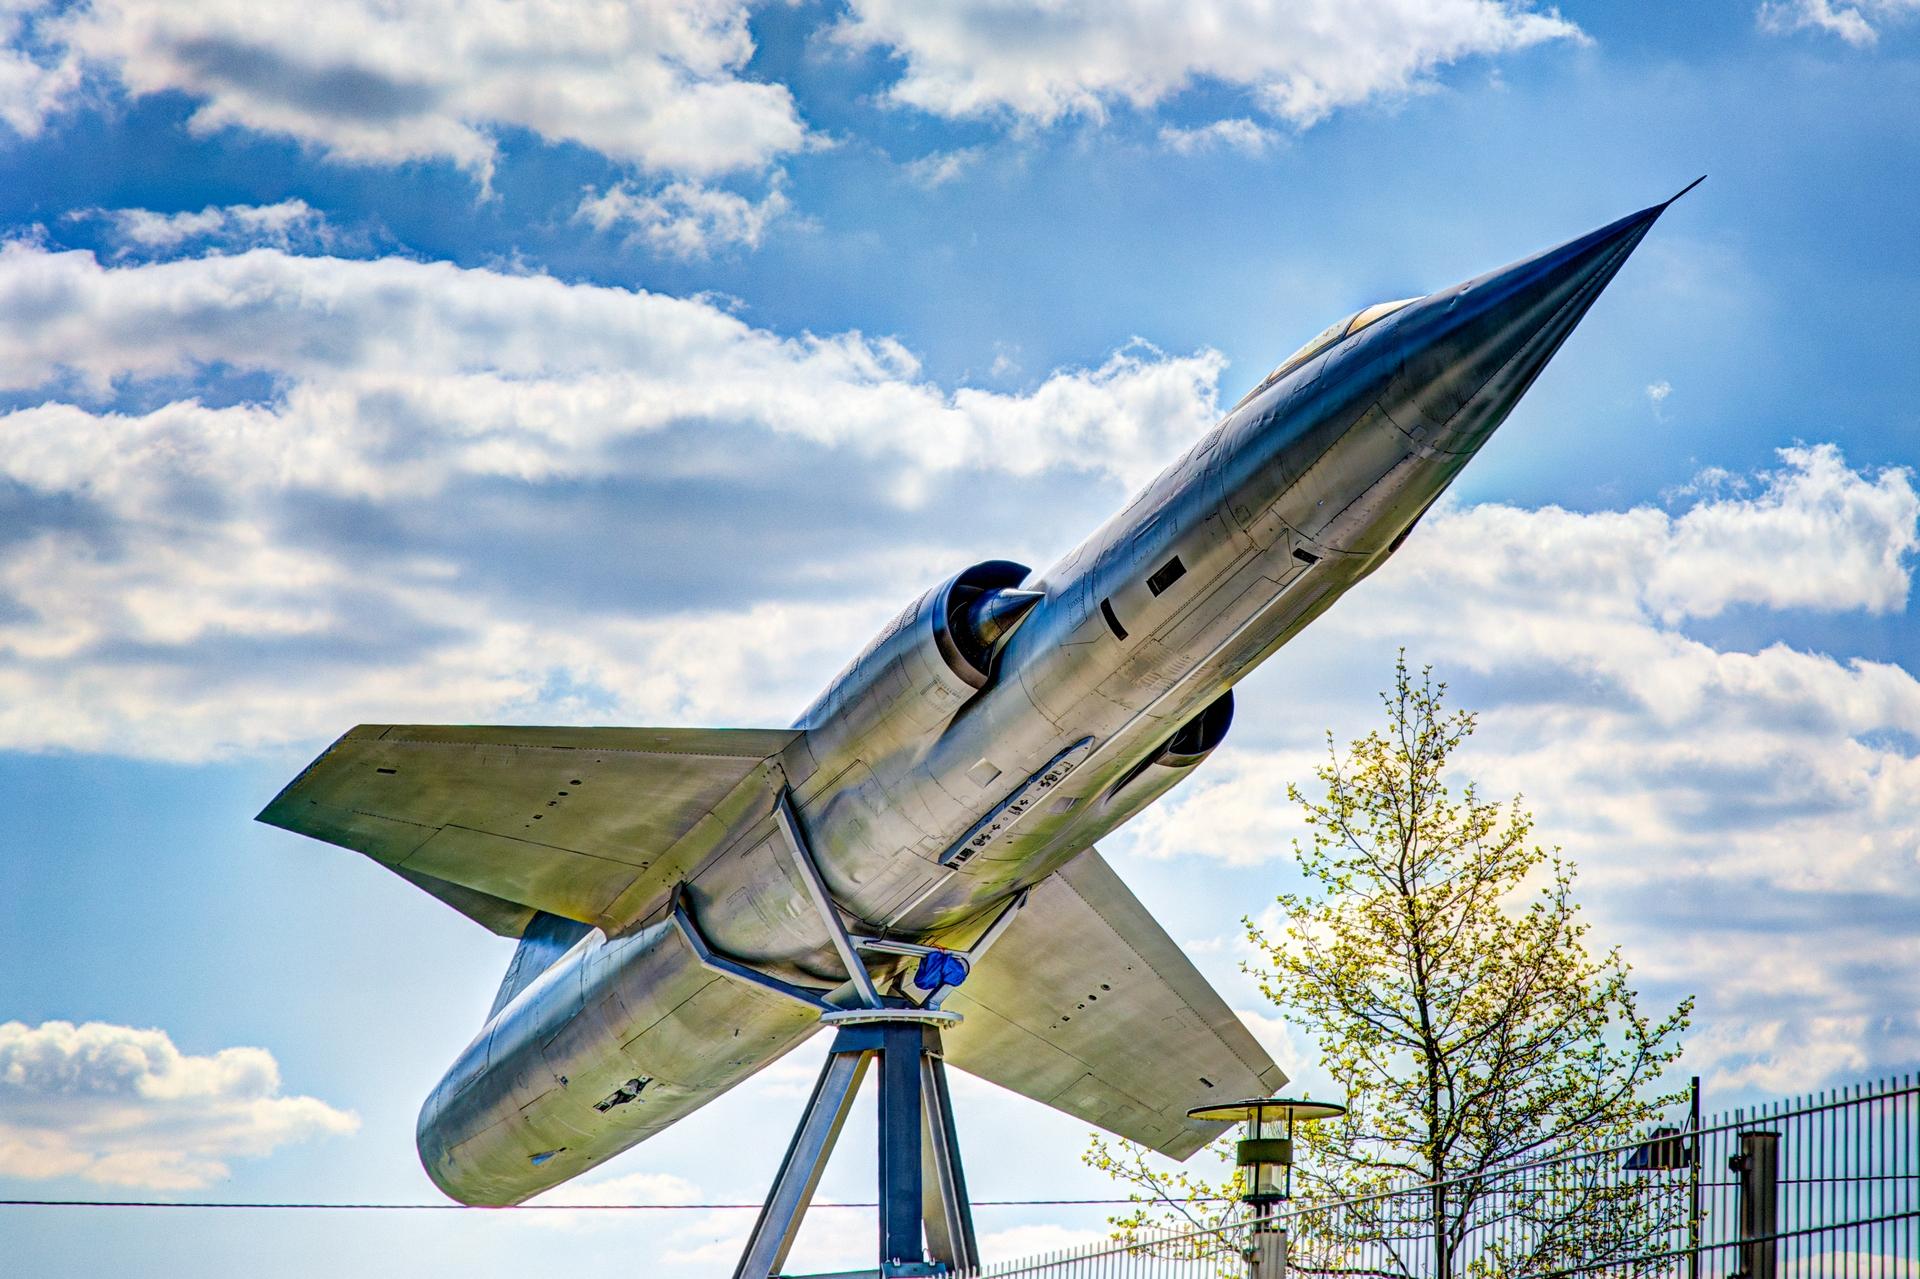 Starfighter by mib4art